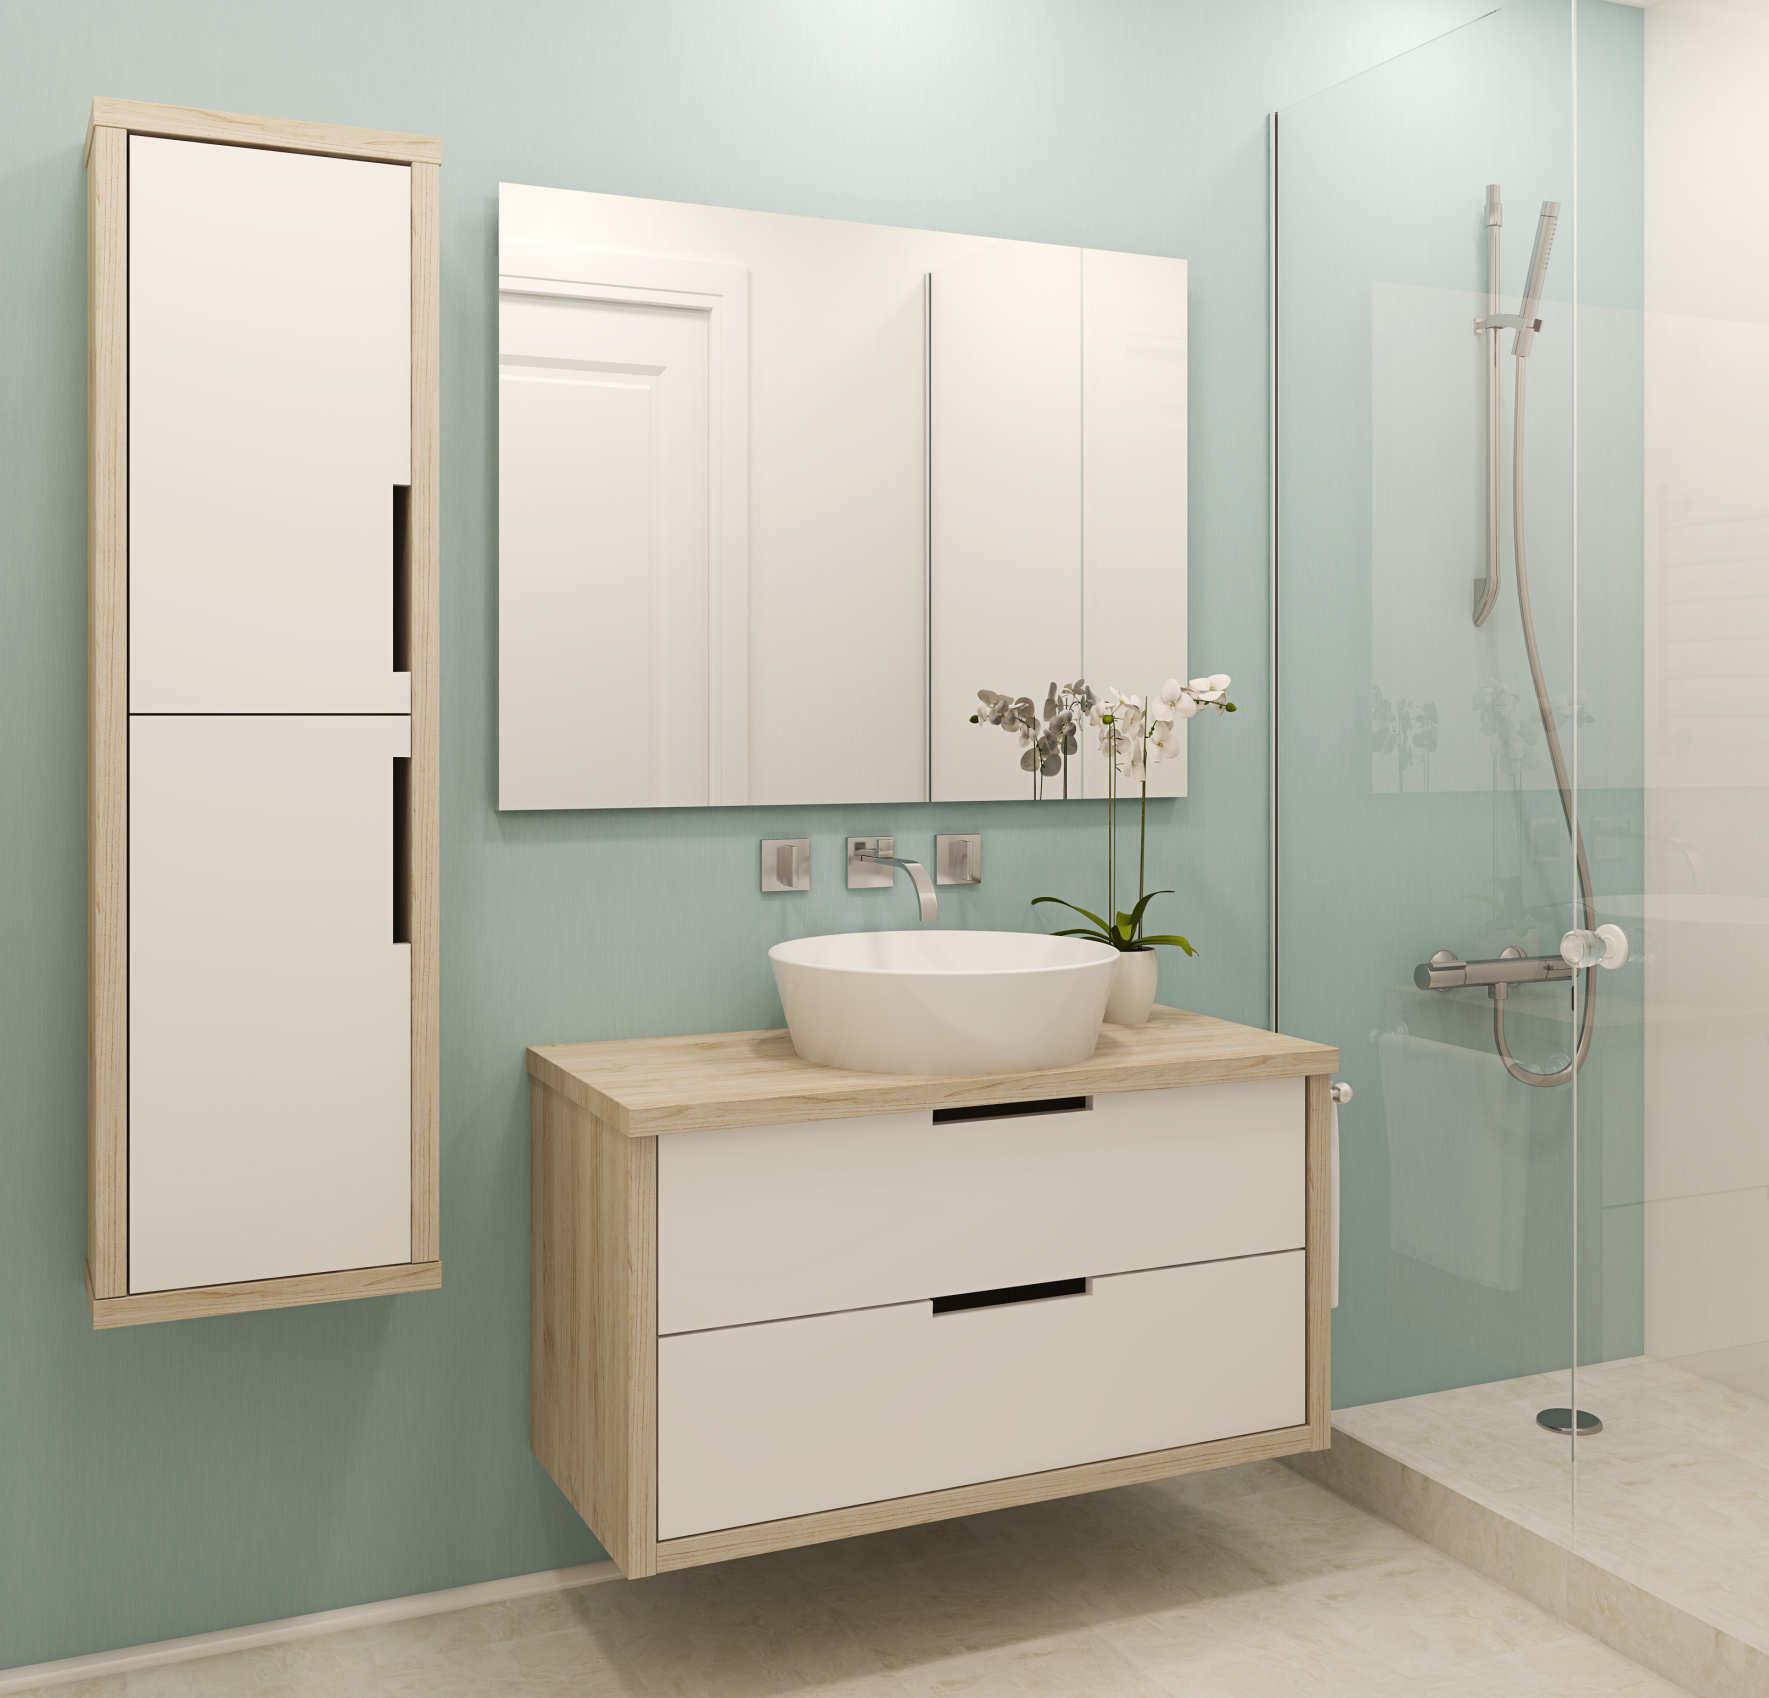 Baño Minimalista Pequeno:minimalista muebles de baño minimalista muebles de baño minimalista